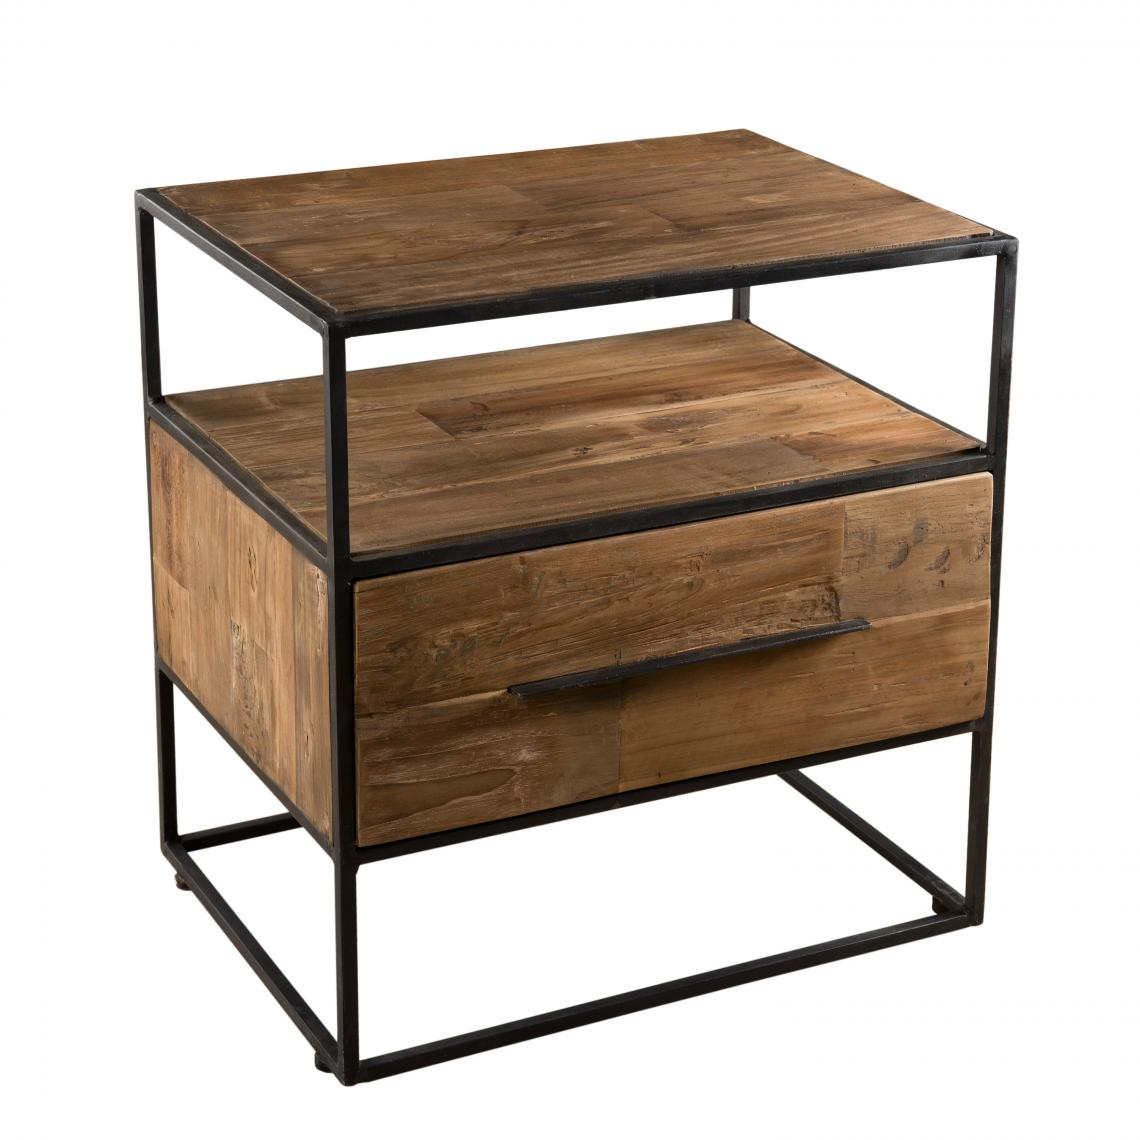 table d appoint 1 tiroir 1 etagere bois